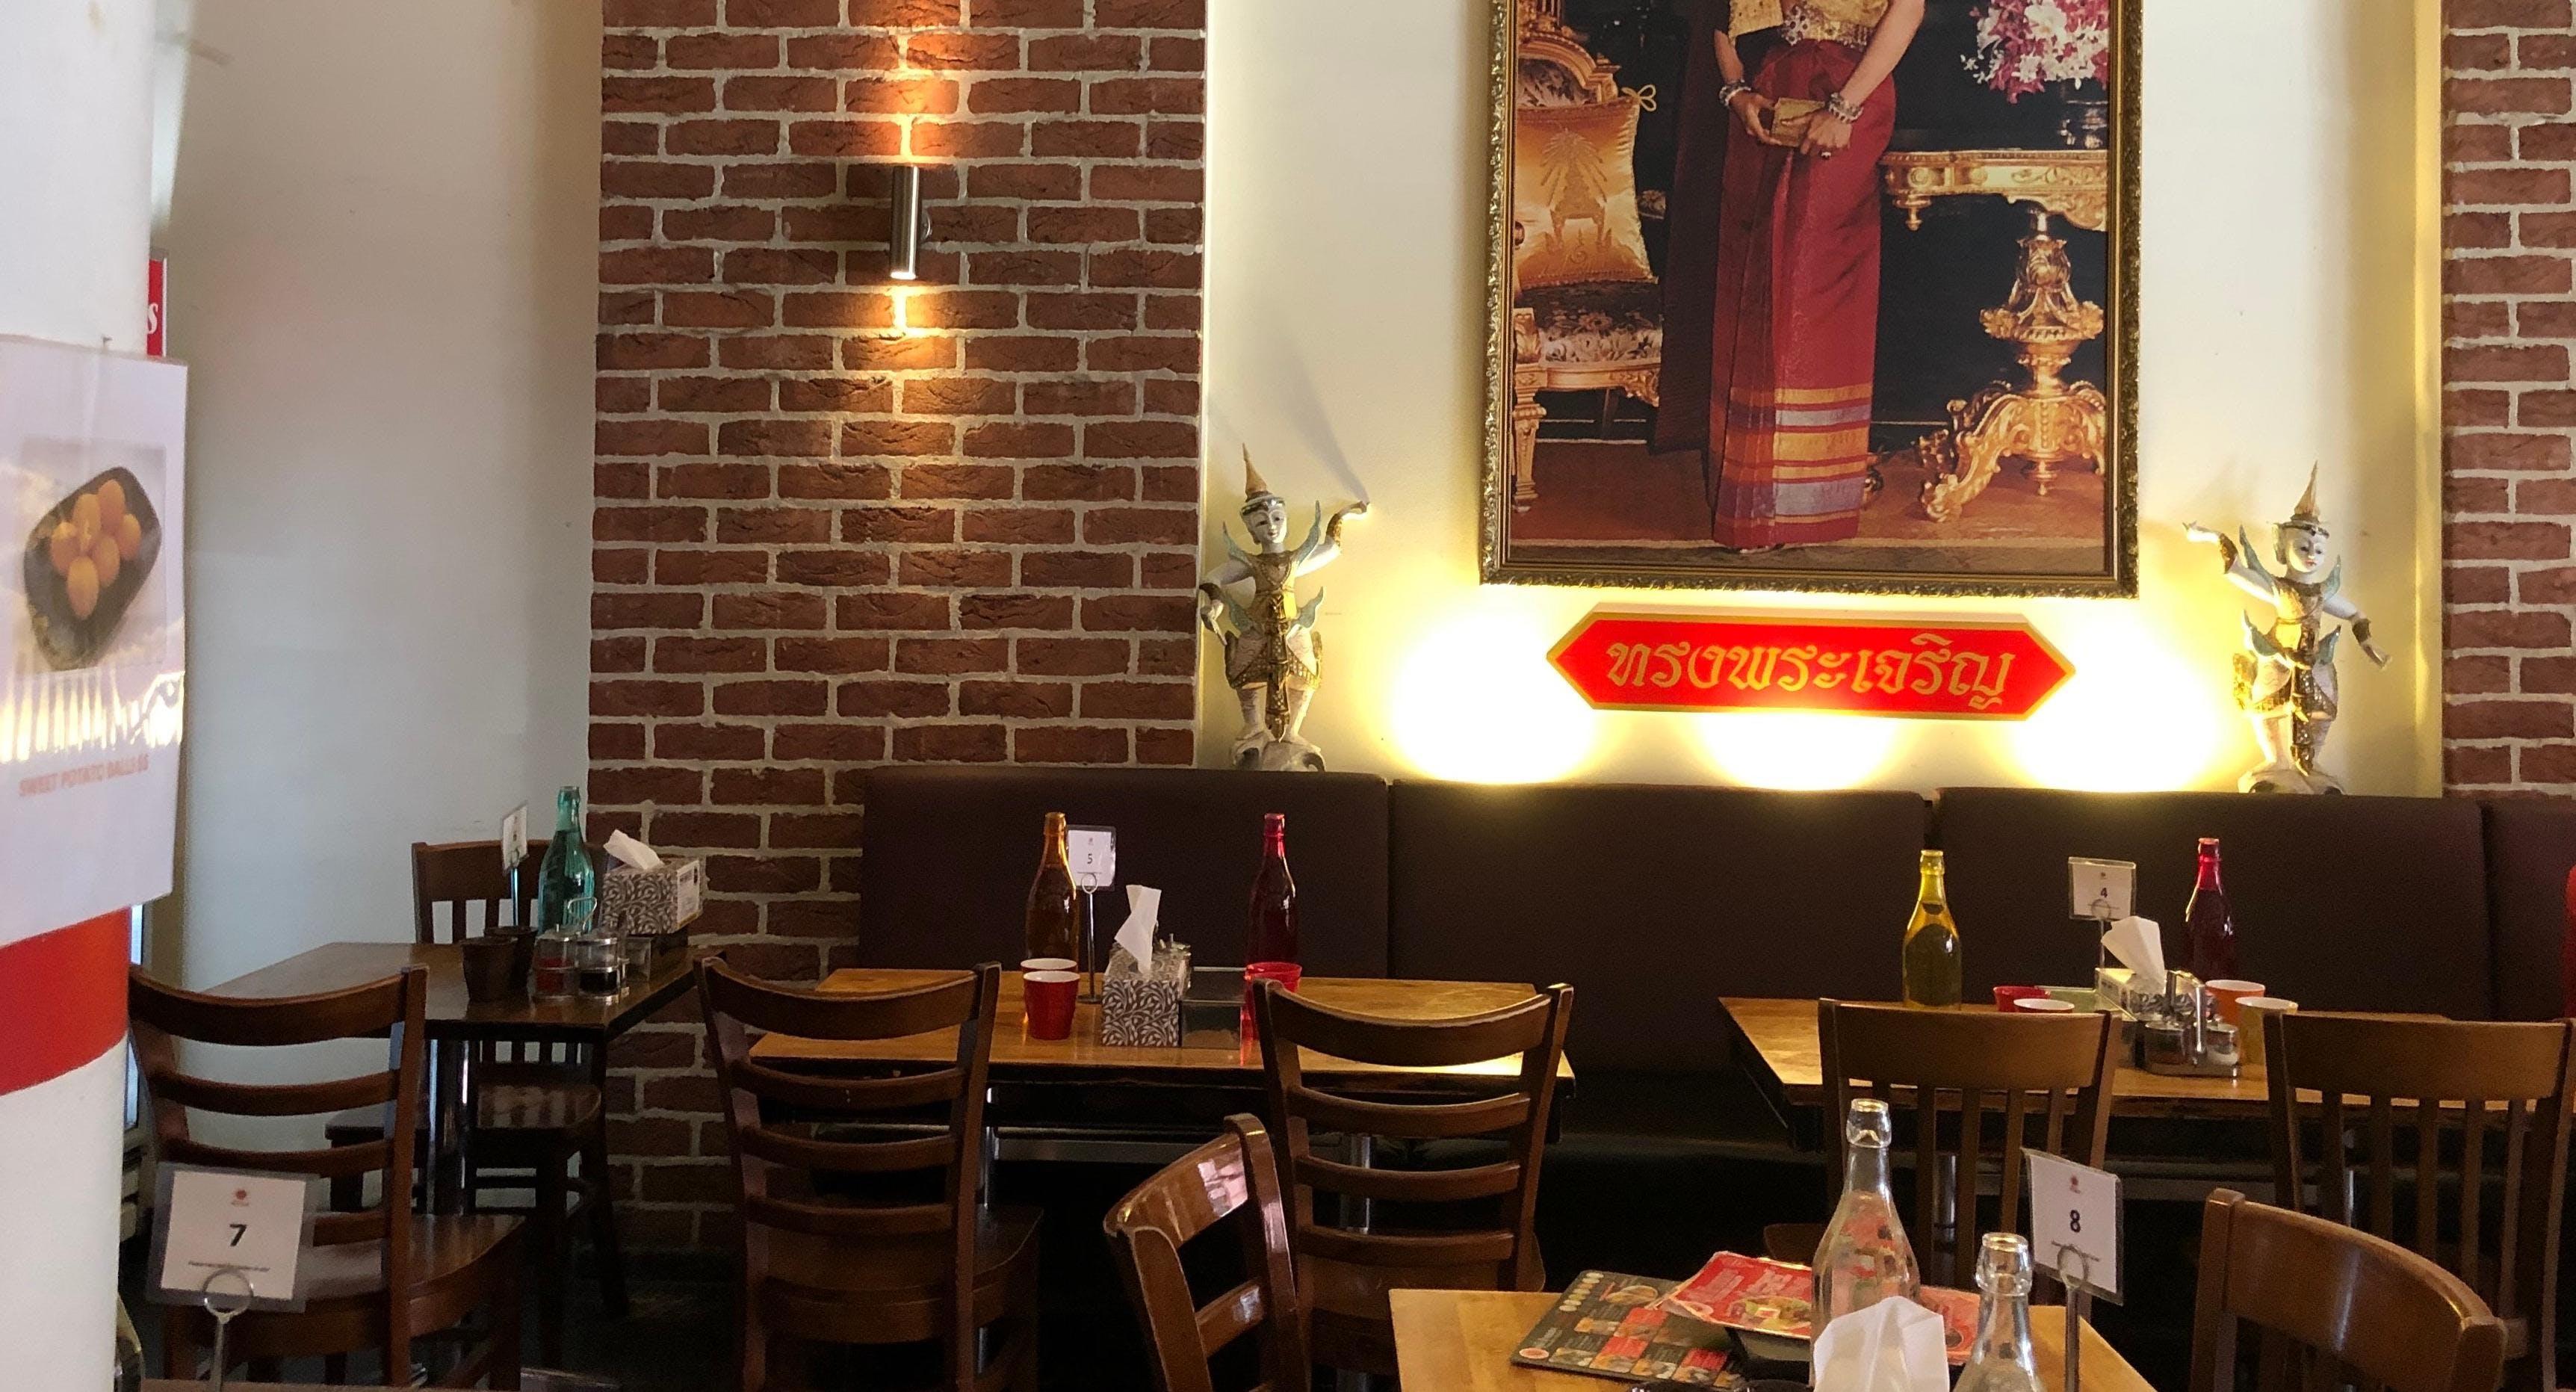 Photo of restaurant Do Dee Paidang in Haymarket, Sydney